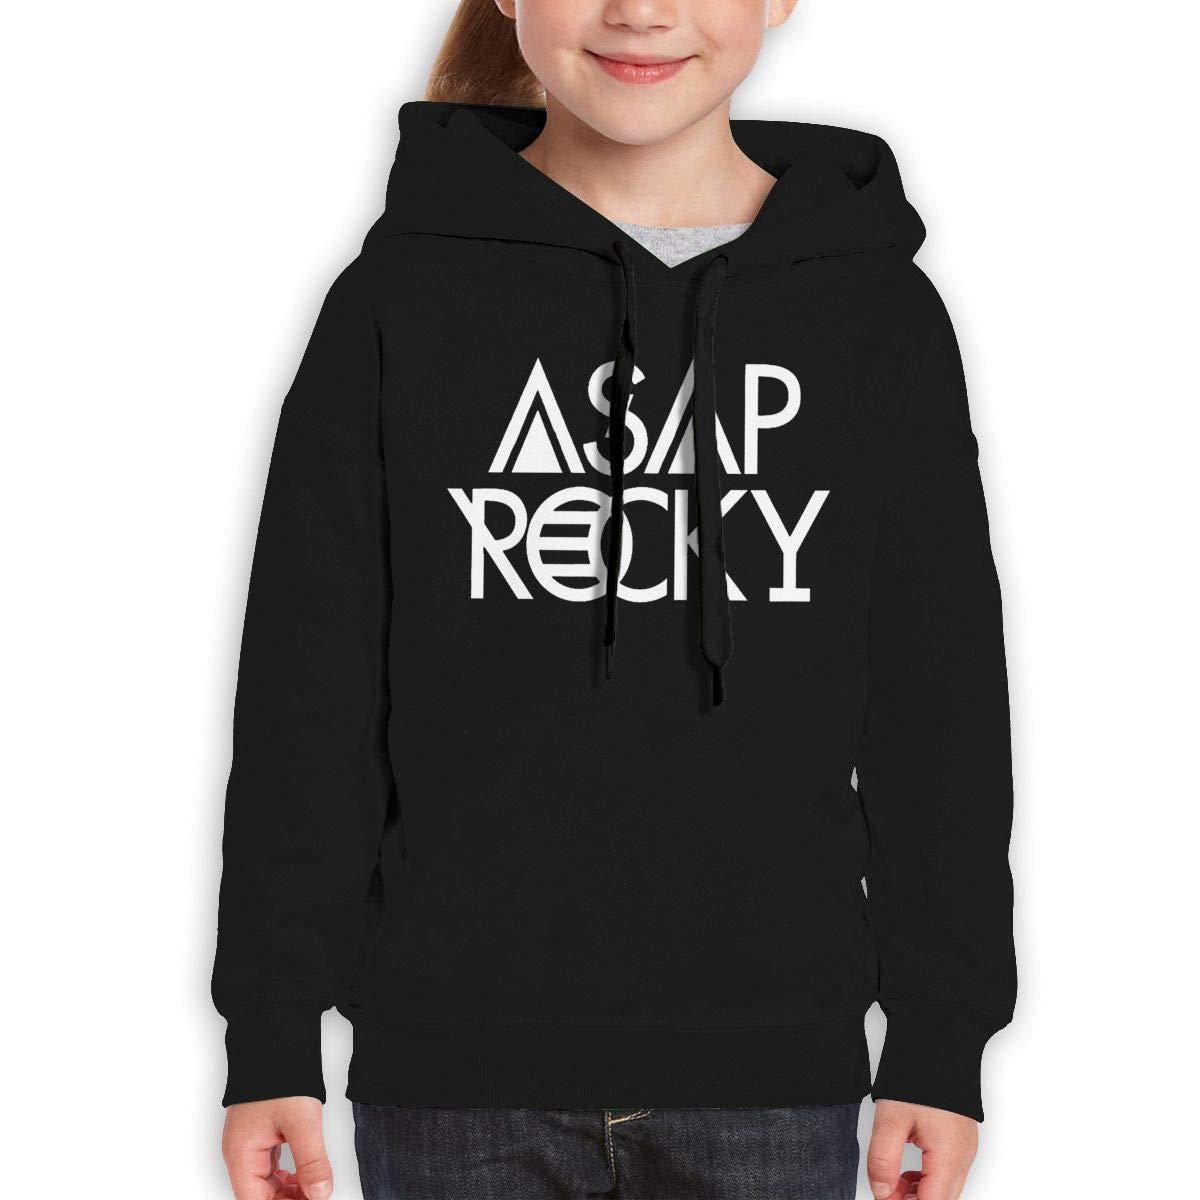 Guiping ASAP Rocky Logo Teen Hooded Sweate Sweatshirt Black